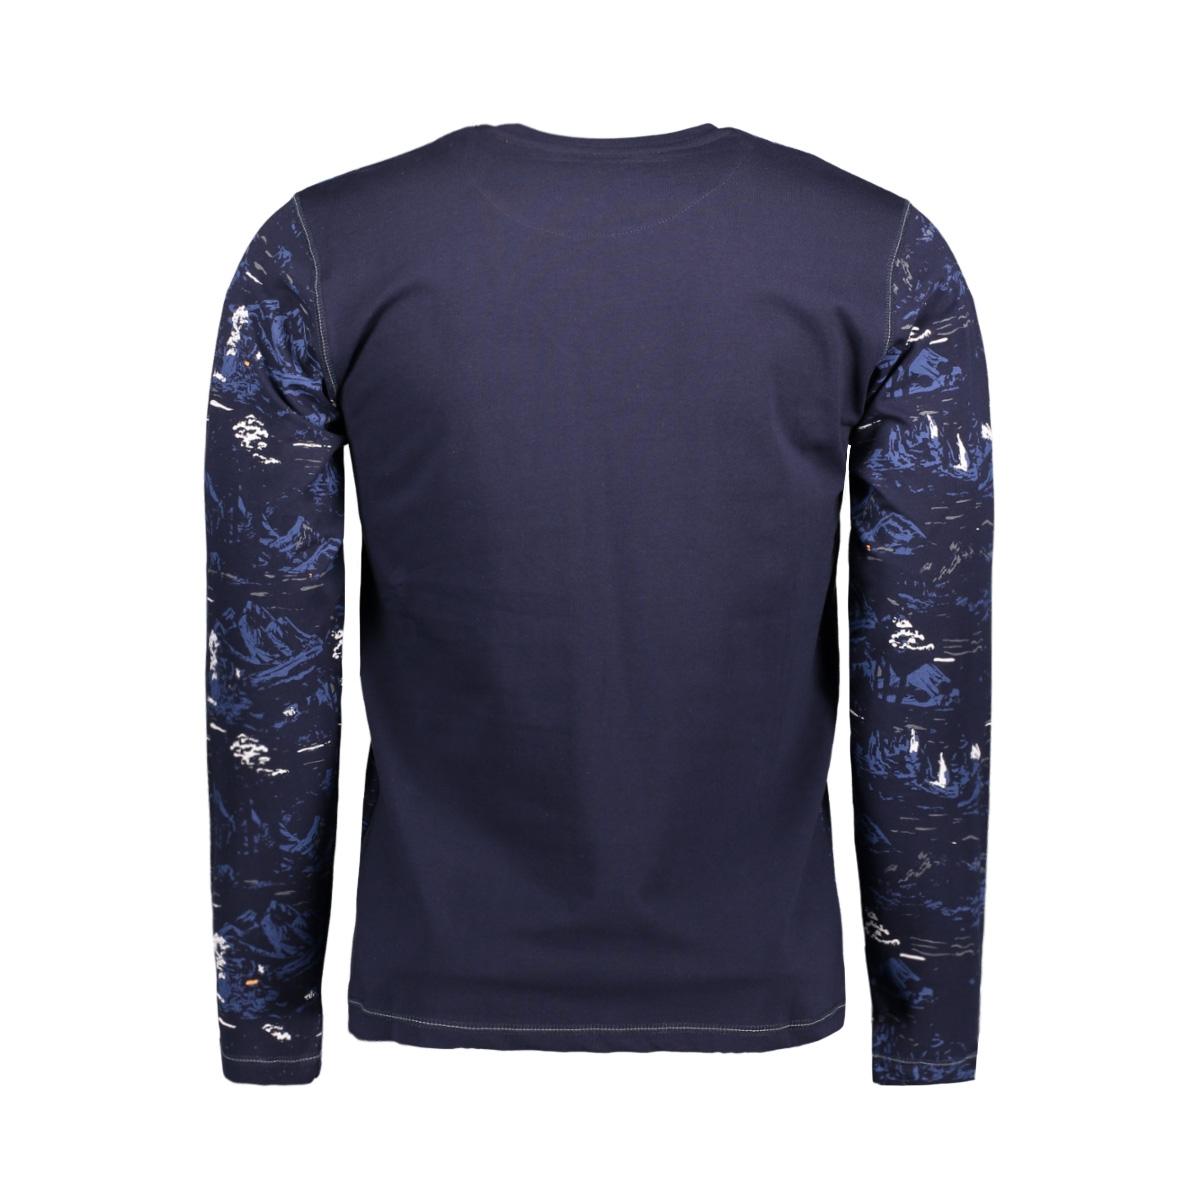 13847 gabbiano t-shirt navy